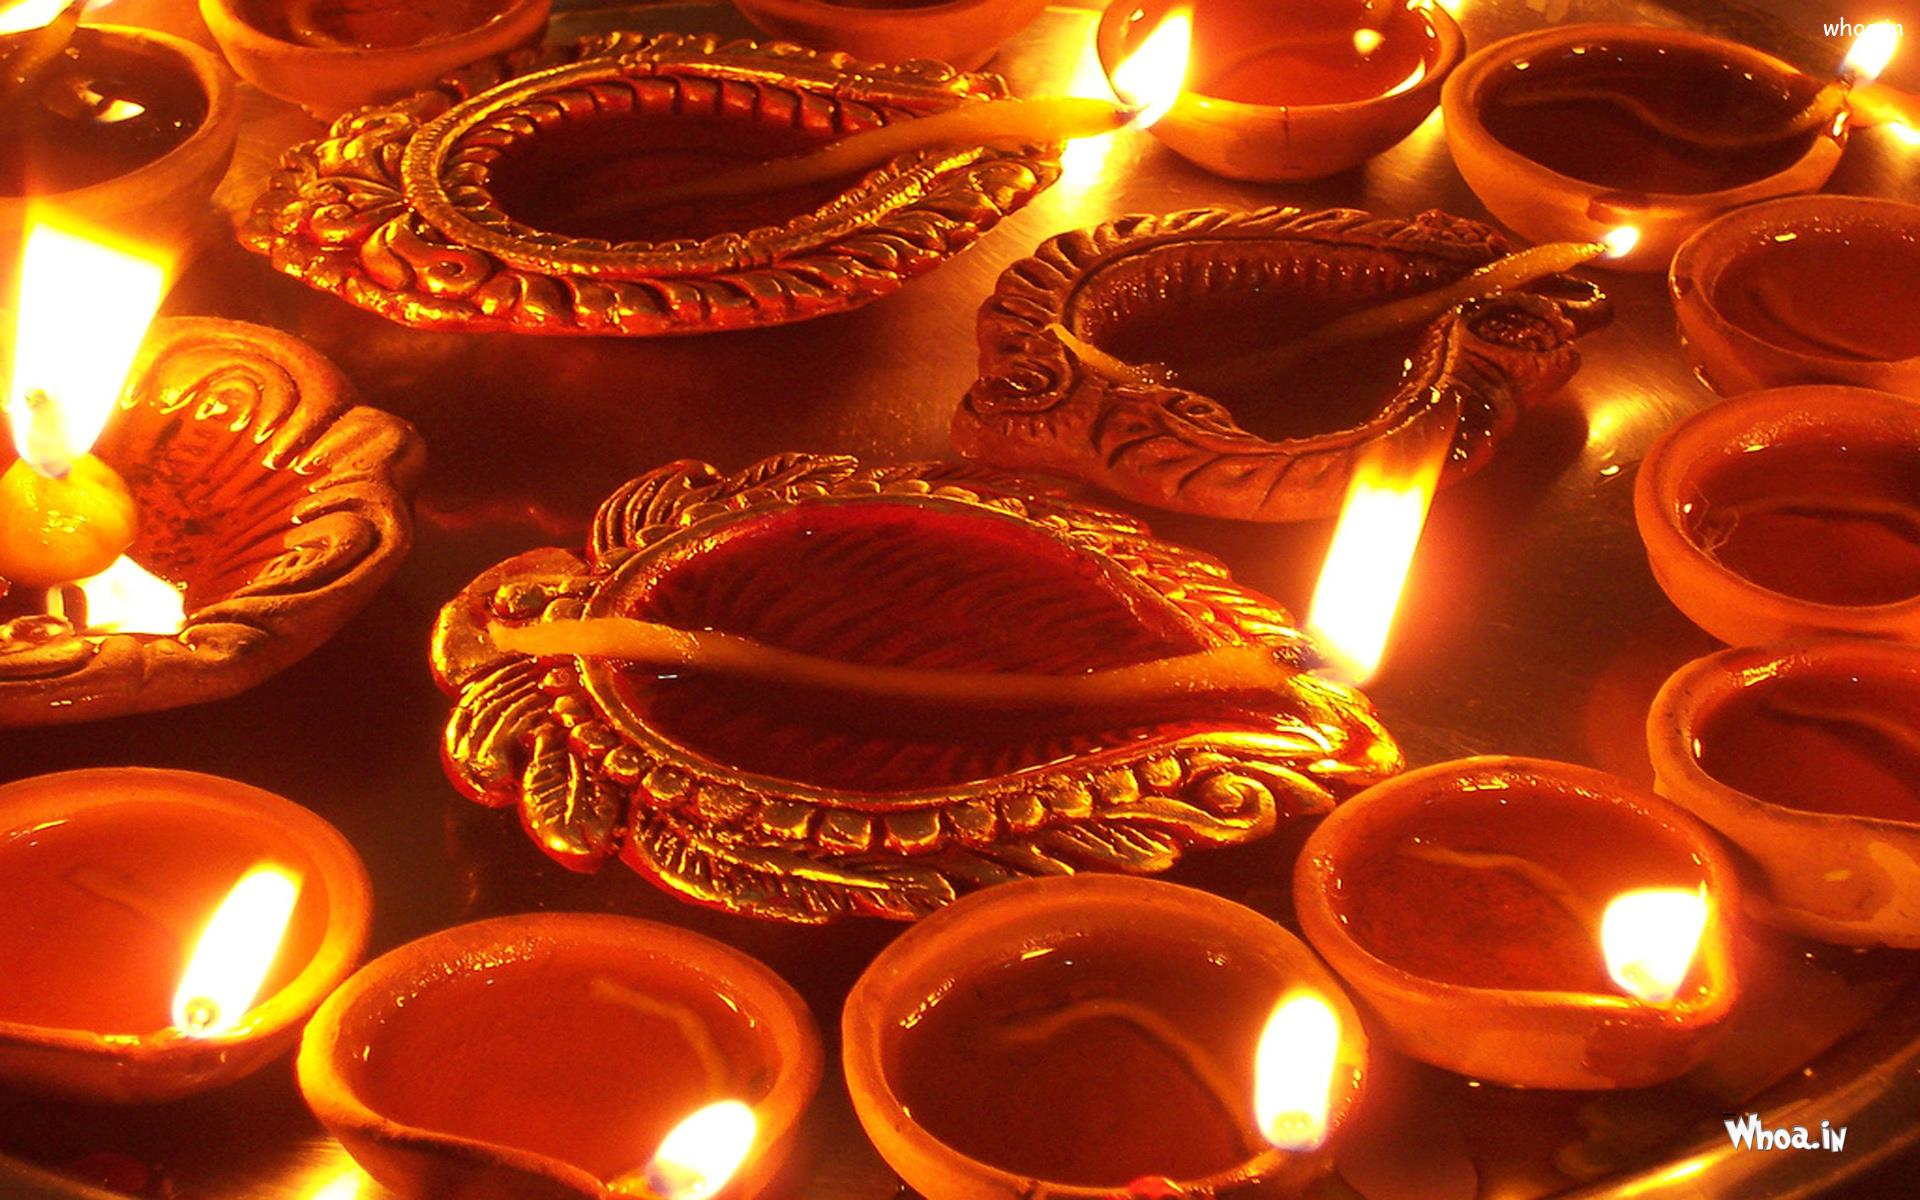 multiple designing deep for diwali greeting wallpaper